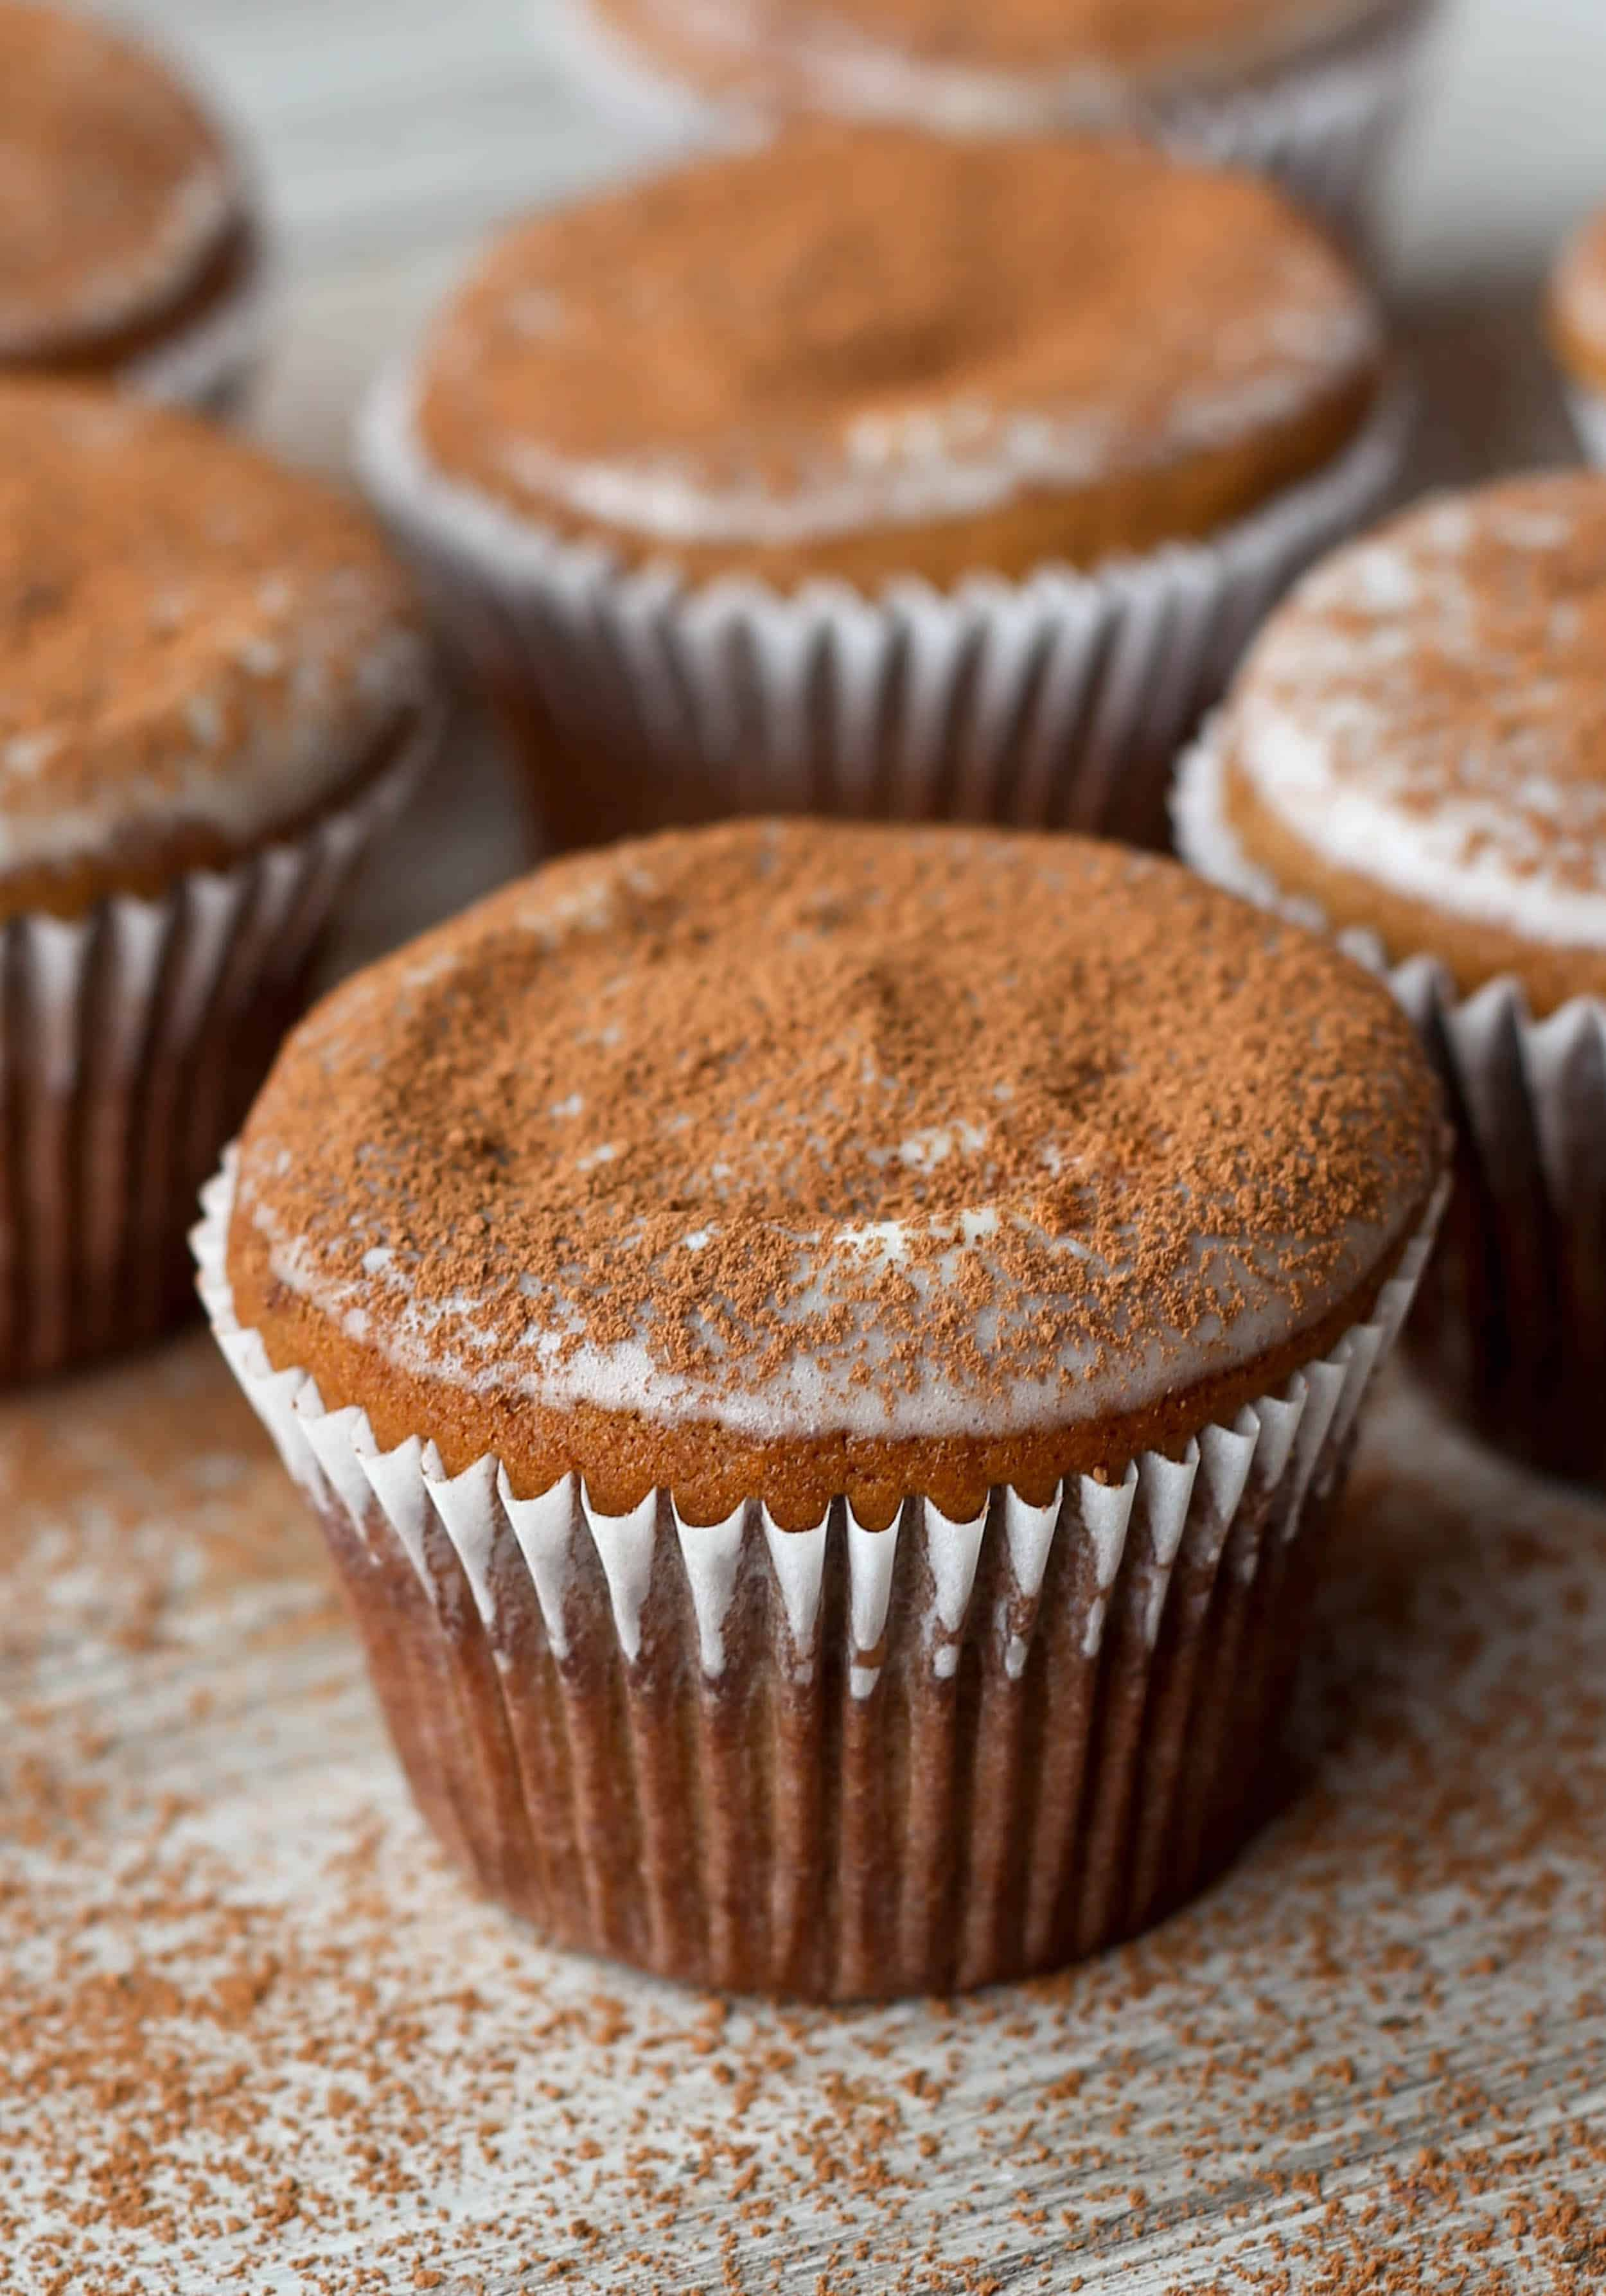 Tiramisu Muffins that are filled with the traditional tiramisu flavors of espresso, cocoa, and mascarpone!